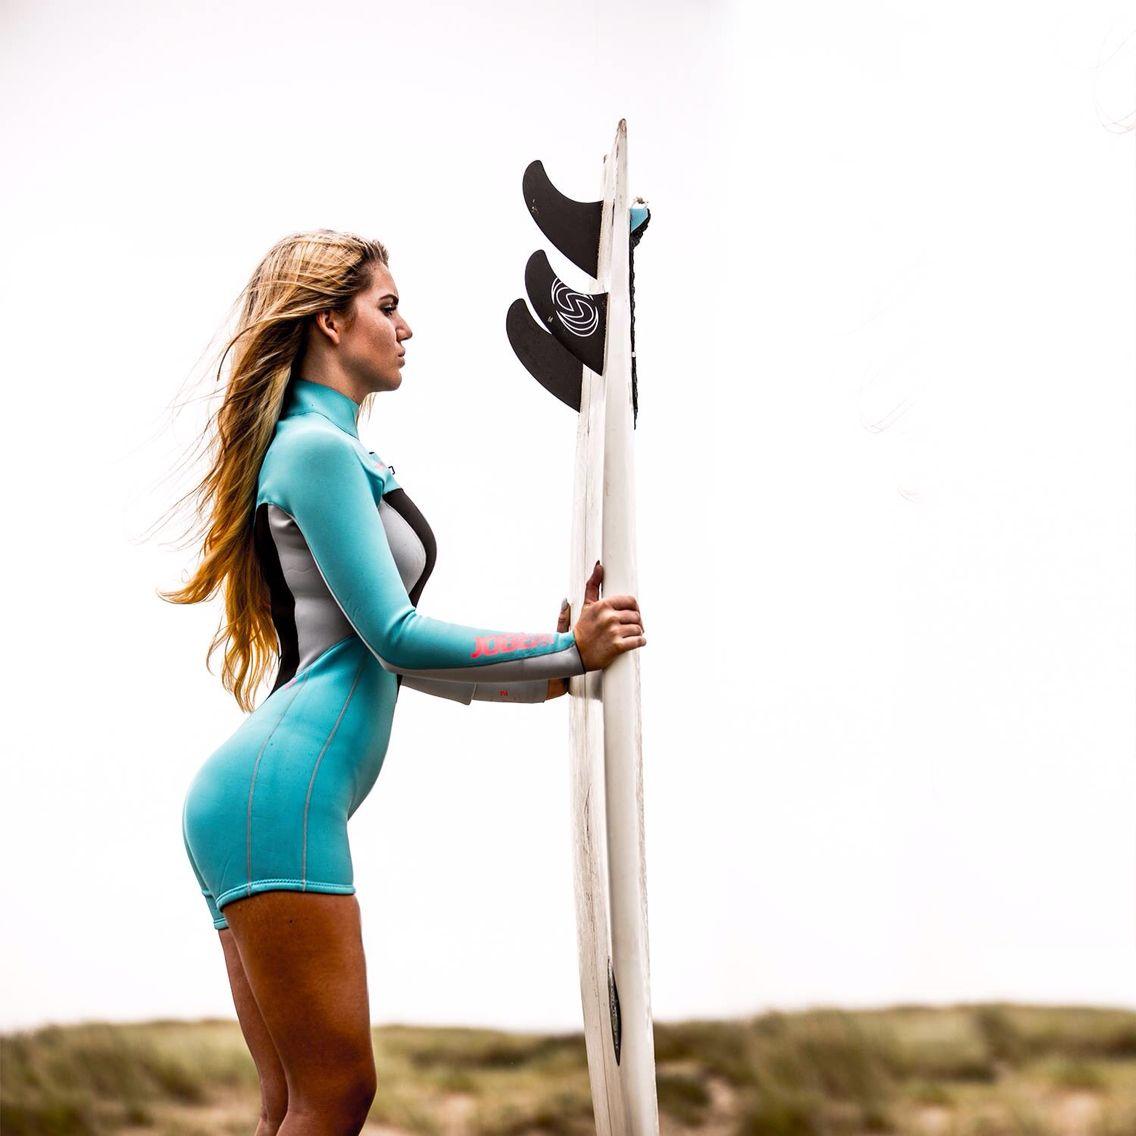 Hacked Olivia Norella nude (59 photo), Ass, Sideboobs, Feet, cameltoe 2015